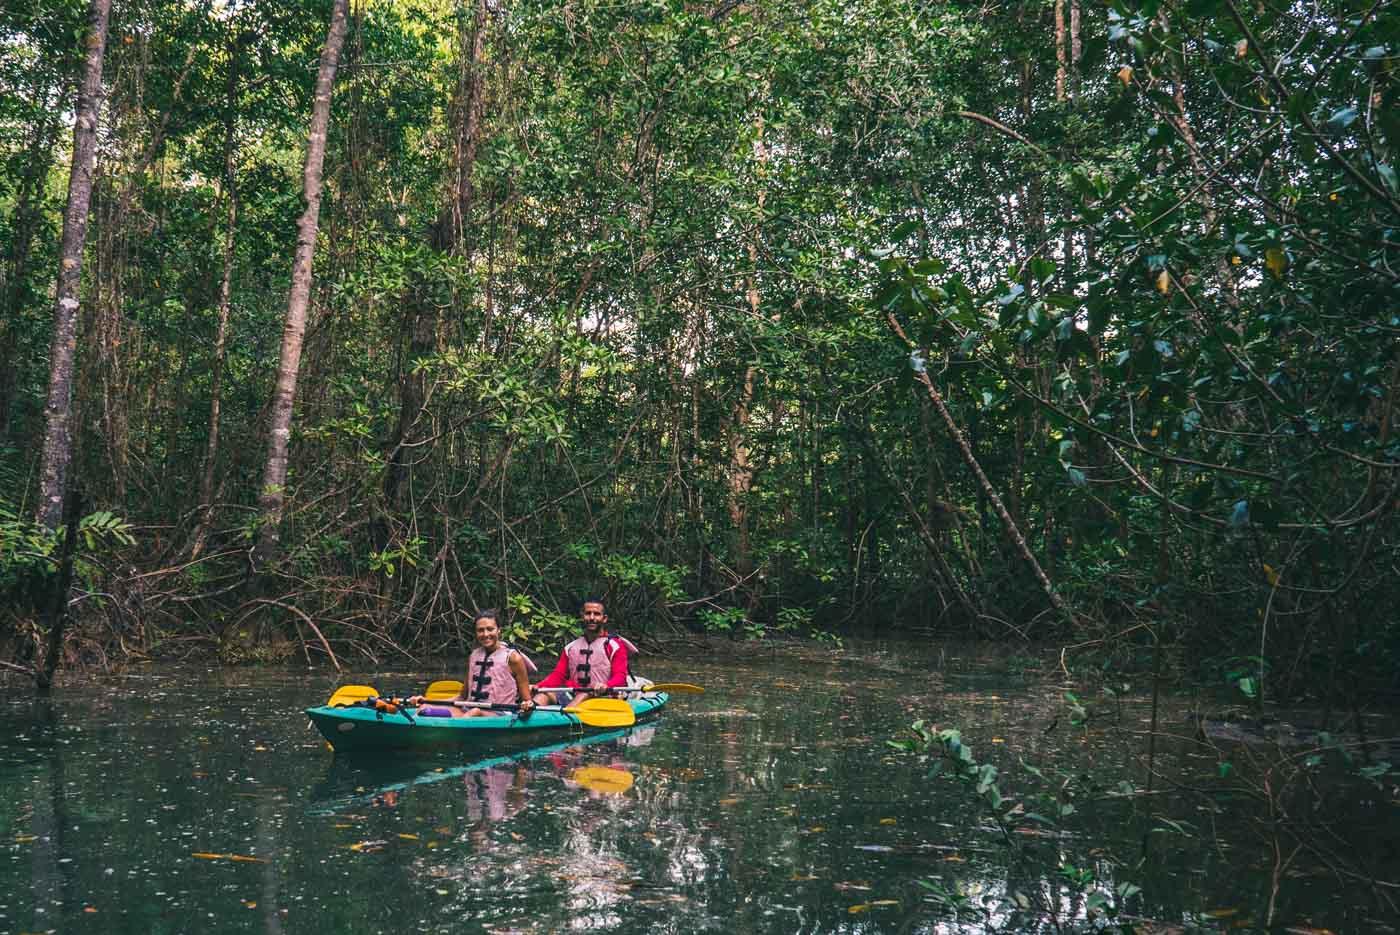 Puerto Jimenez Costa Rica: Kayaking in the mangroves of Osa Peninsula